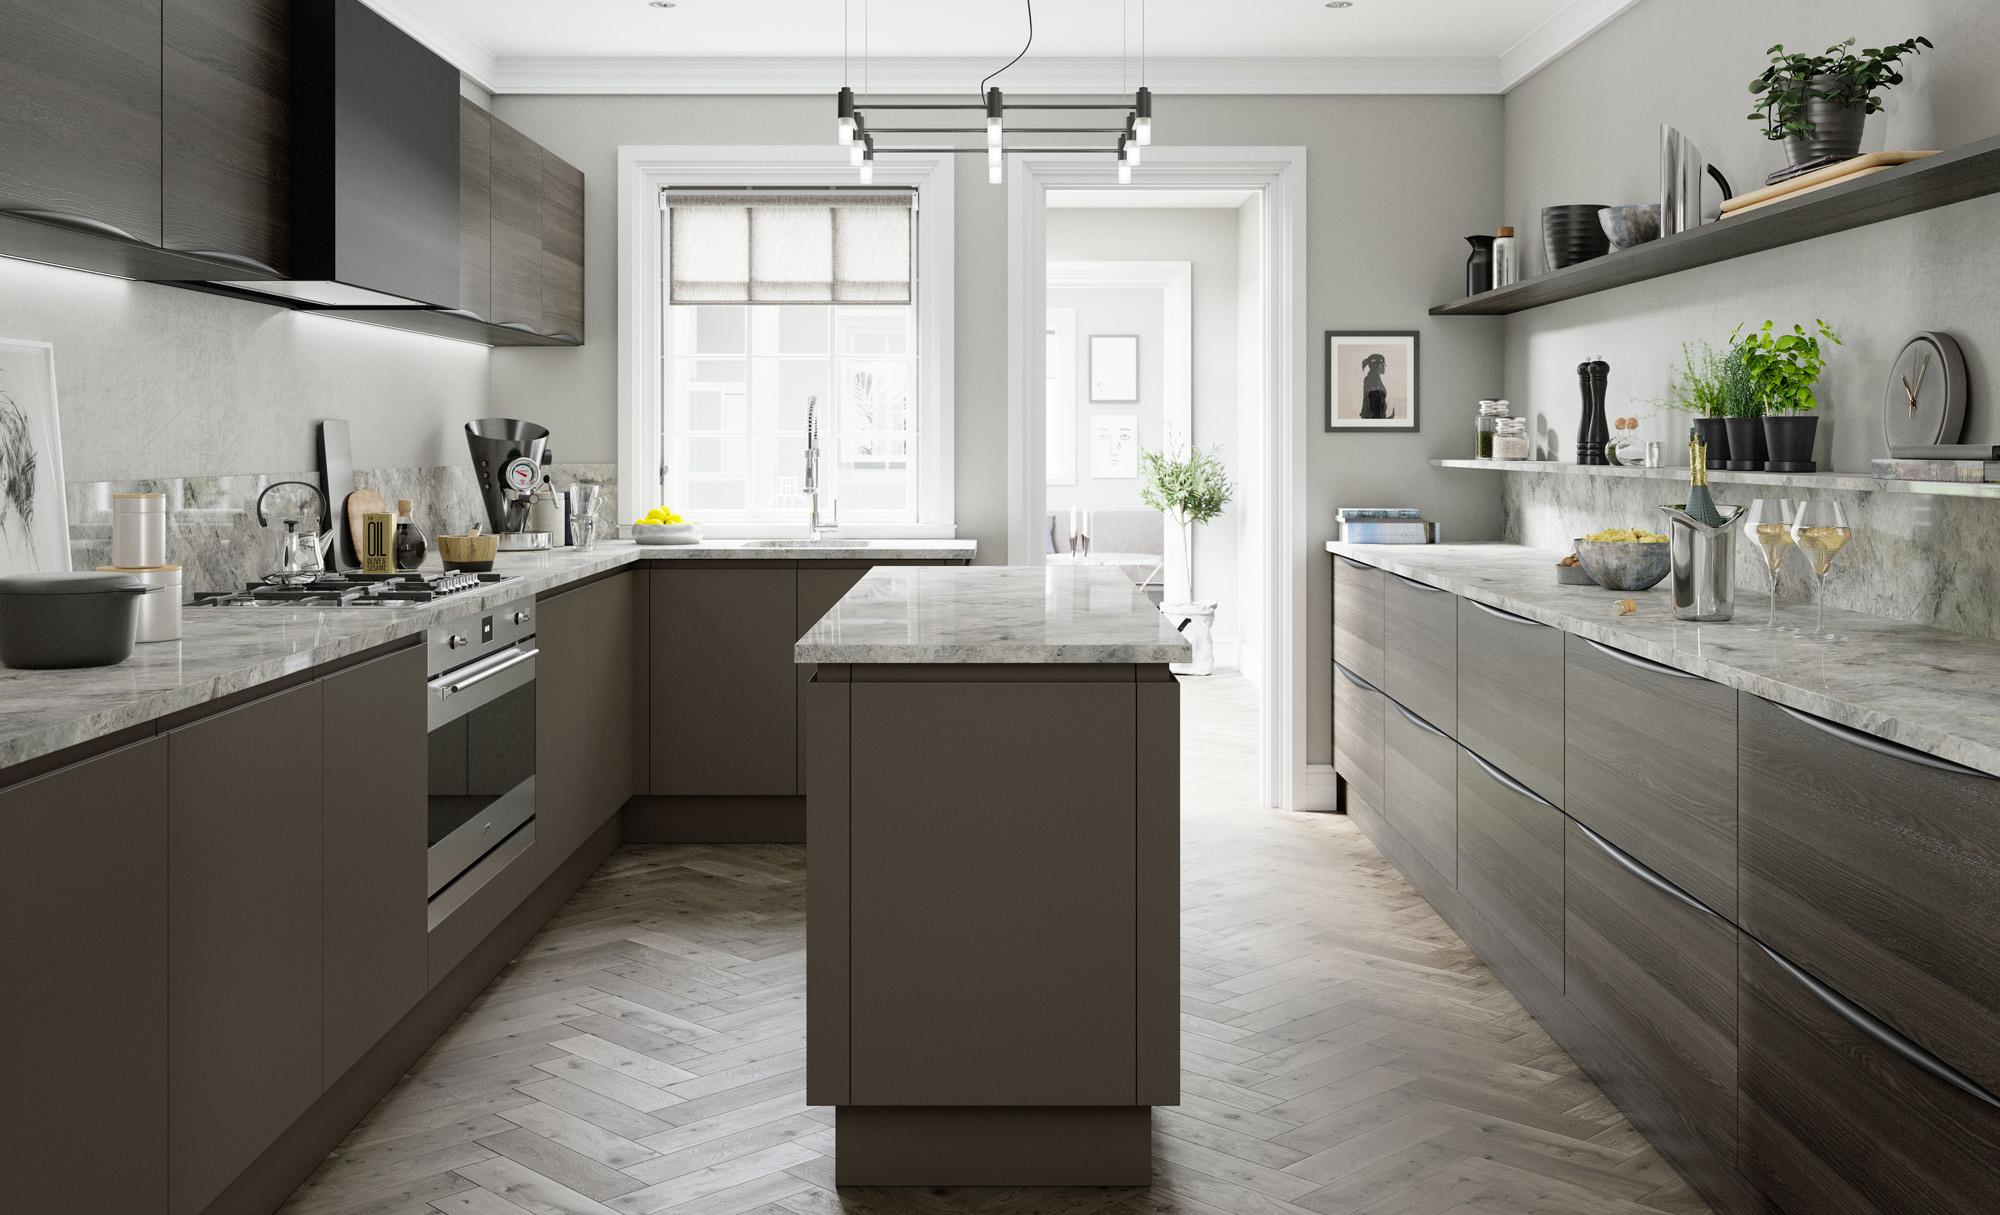 Modern Contemporary Tavola Stained Carbon Oak, Strada Matte Painted Lava Kitchen - Kitchen Design - Alan Kelly Kitchens - Waterford